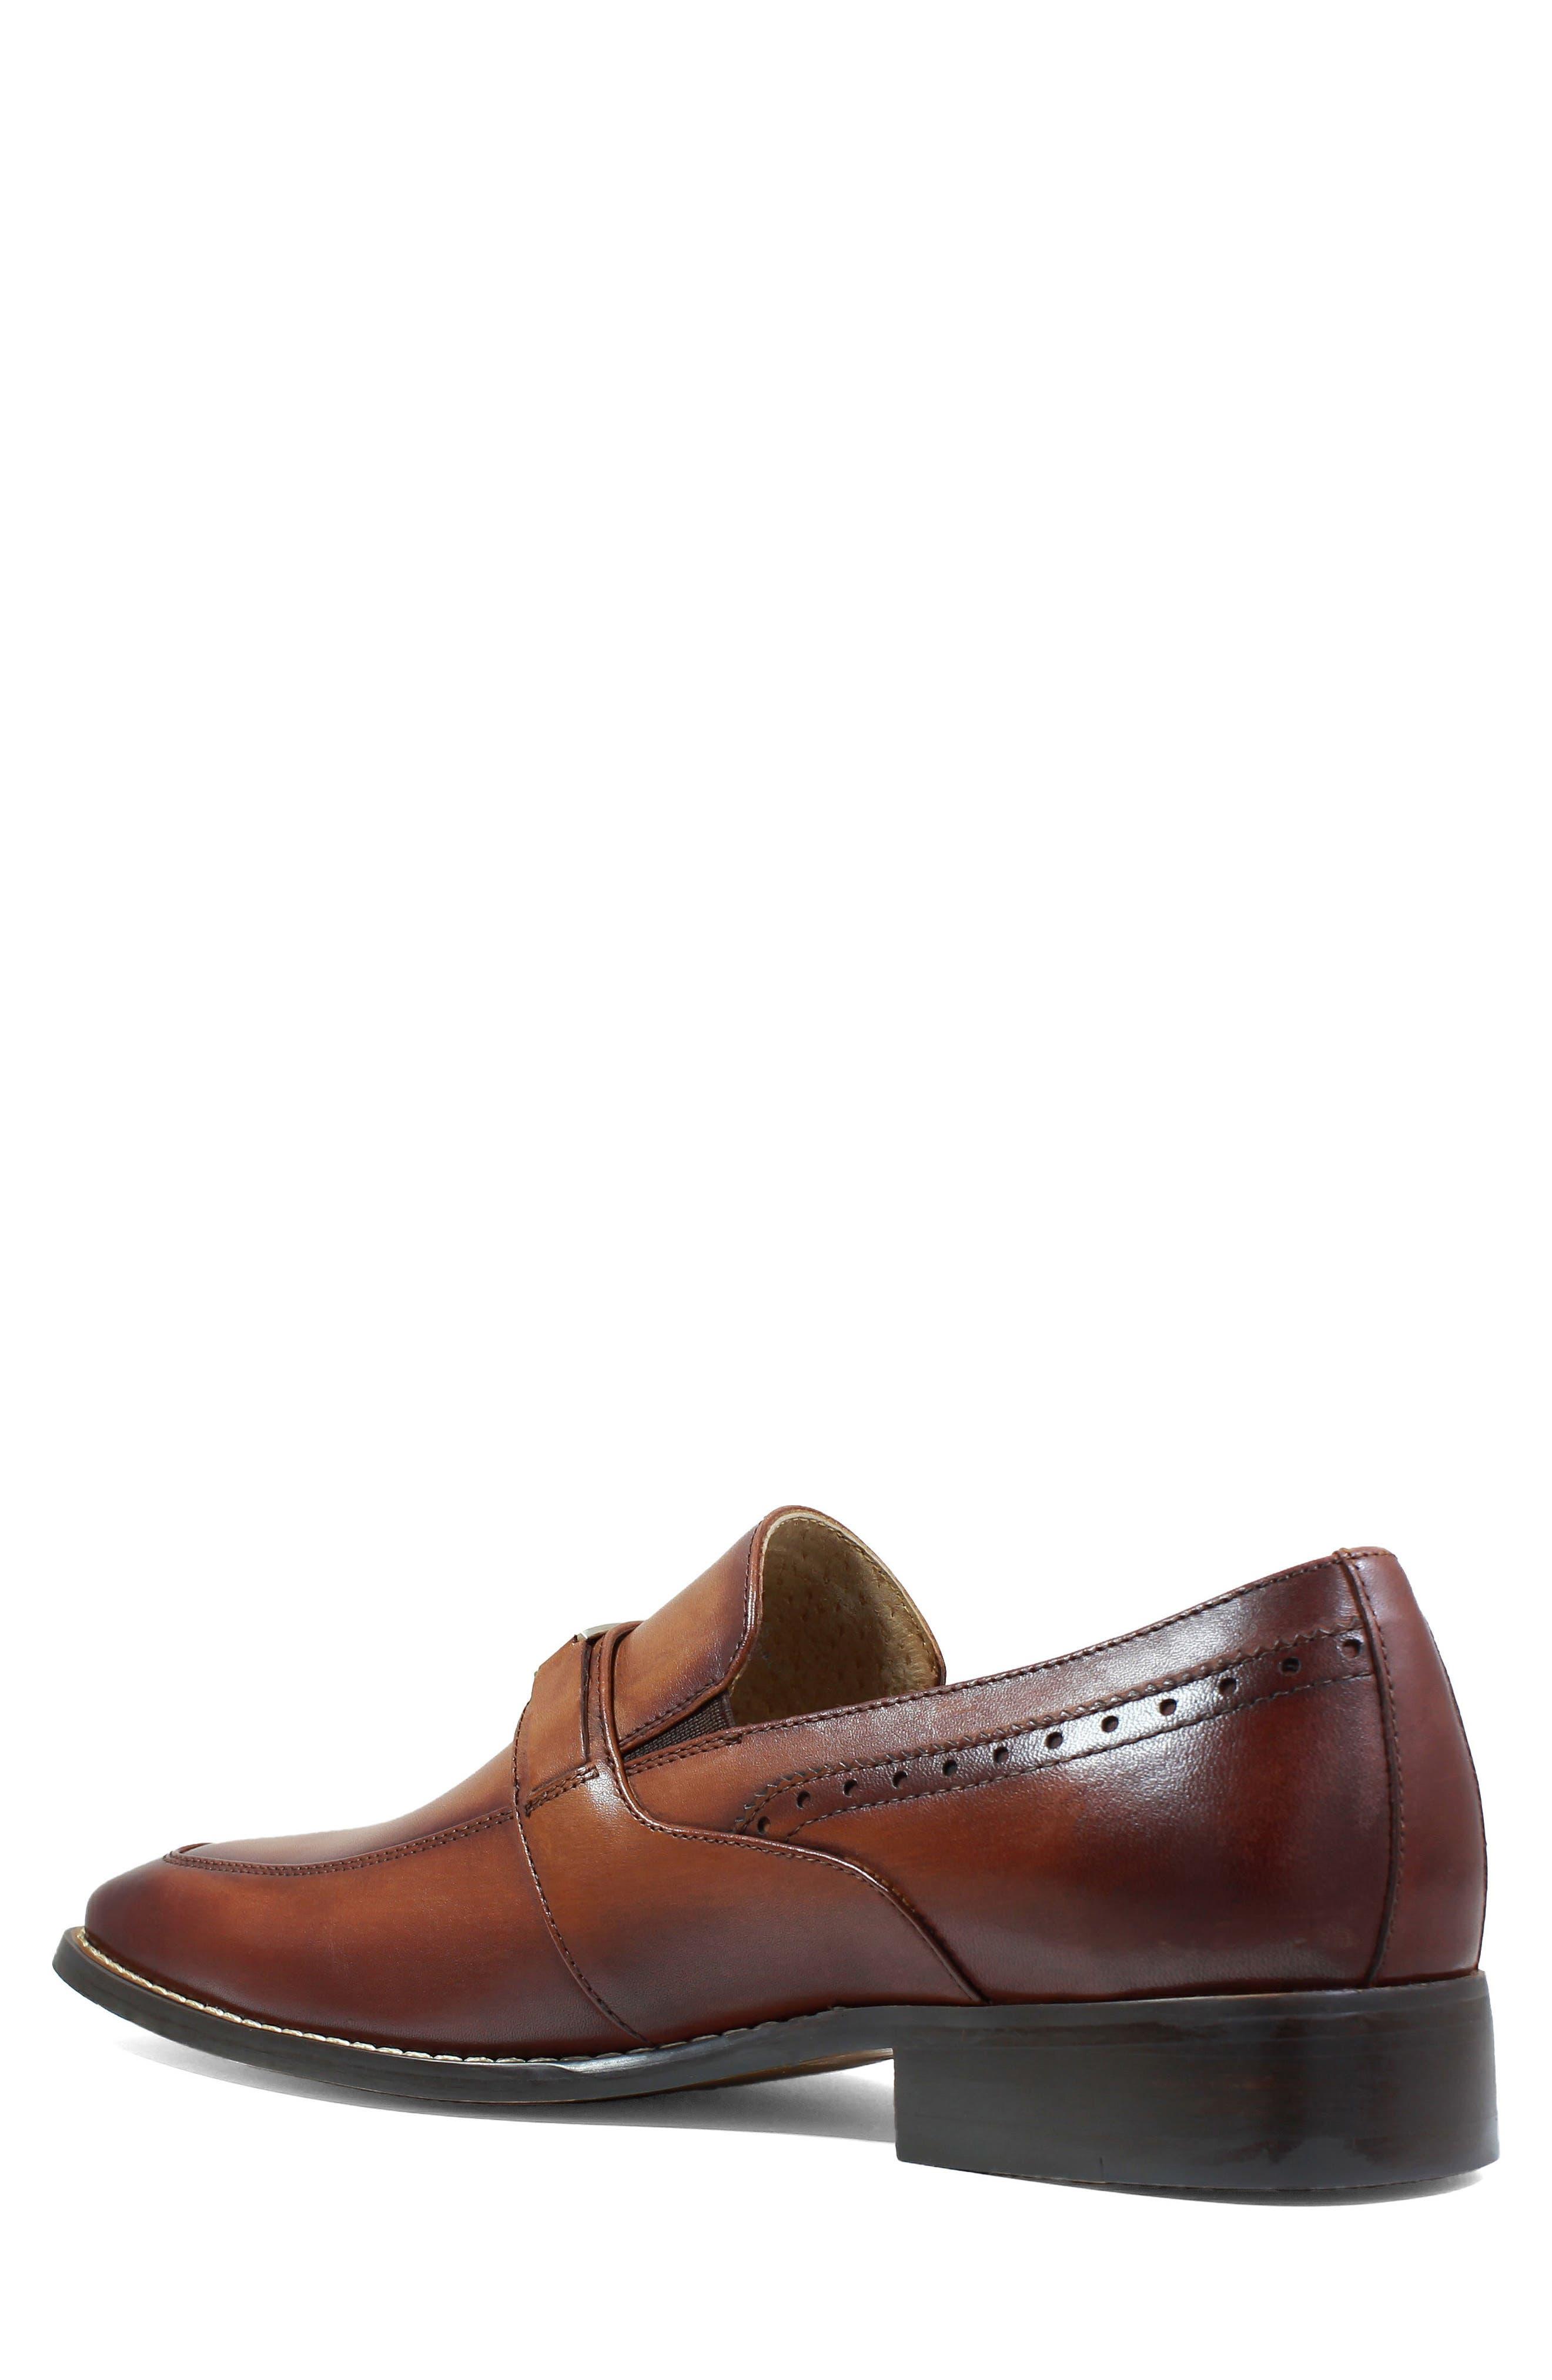 Shaw Bit Loafer,                             Alternate thumbnail 2, color,                             Cognac Leather